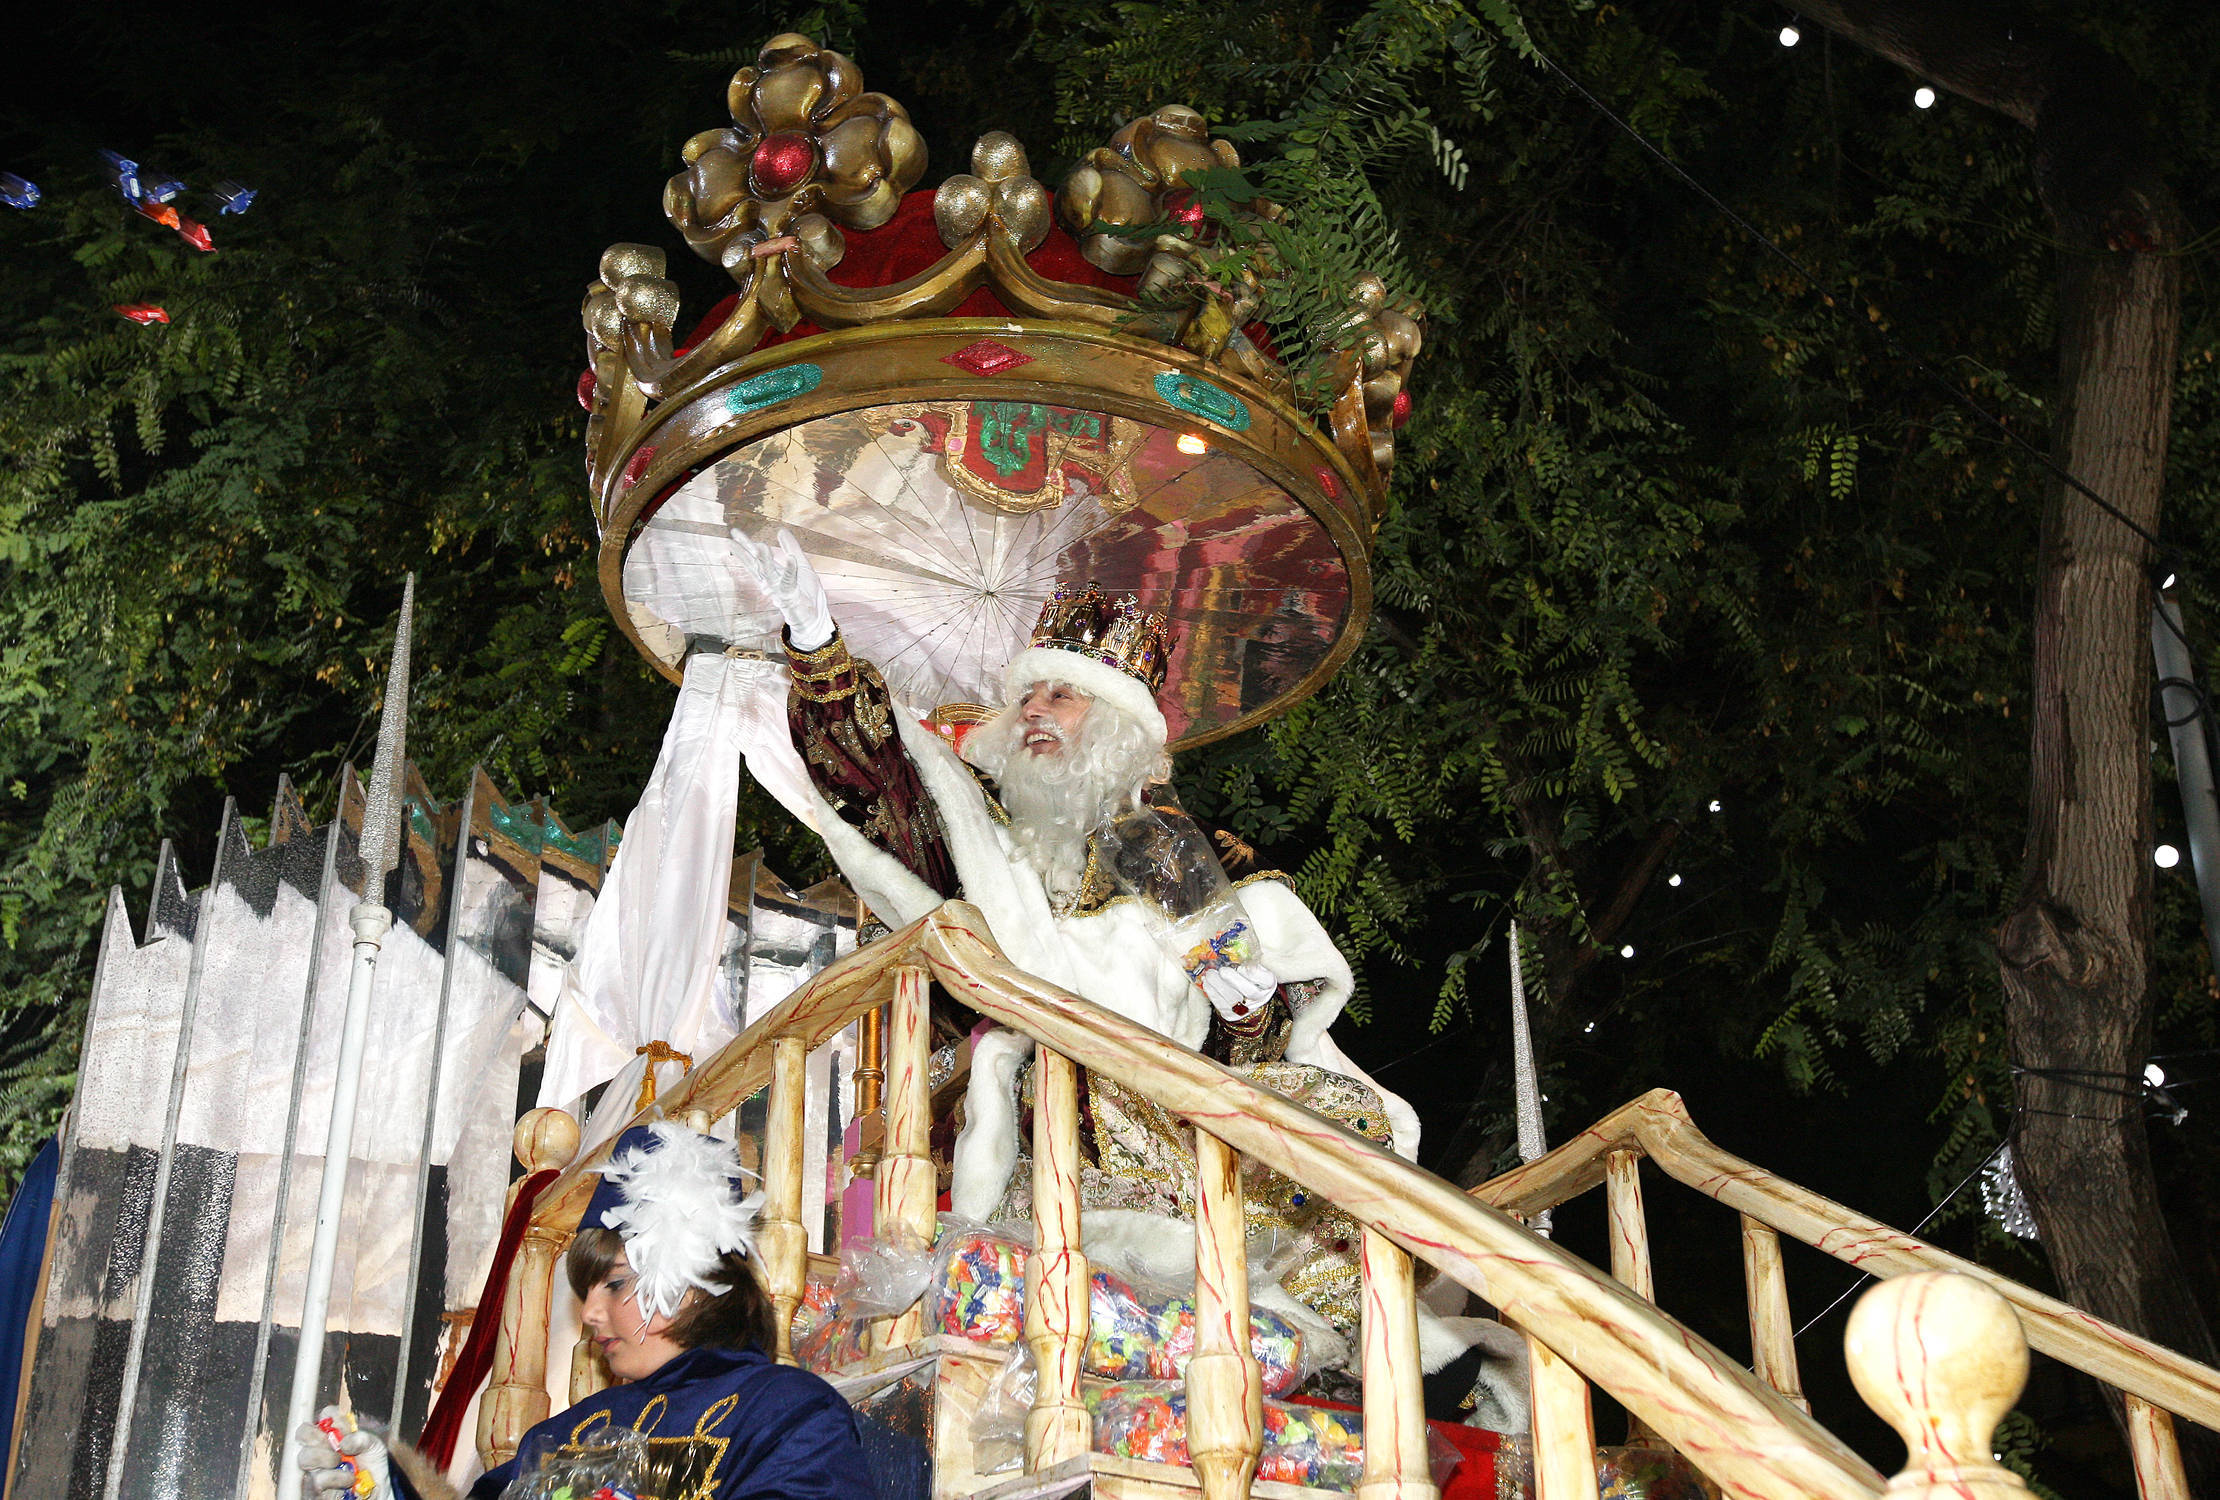 El rei Melcior saludant al pas de la cavalcada per la Rambla Nova. Foto Olívia Molet